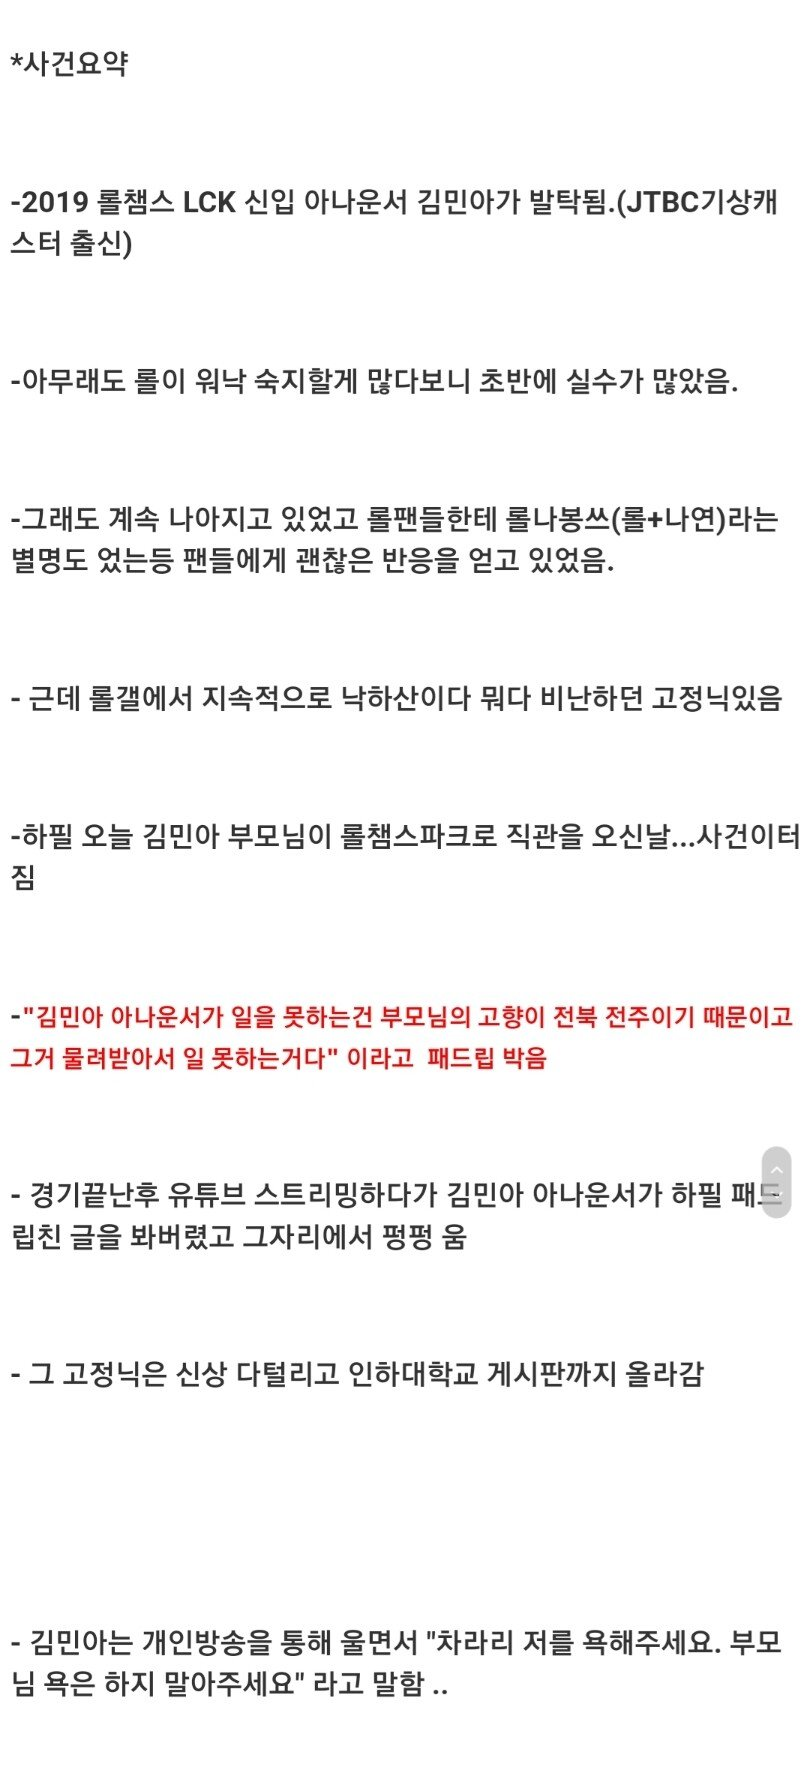 Screenshot_20190316-090508.jpg 패드립에 멘탈 나간 롤챔스 LCK 아나운서